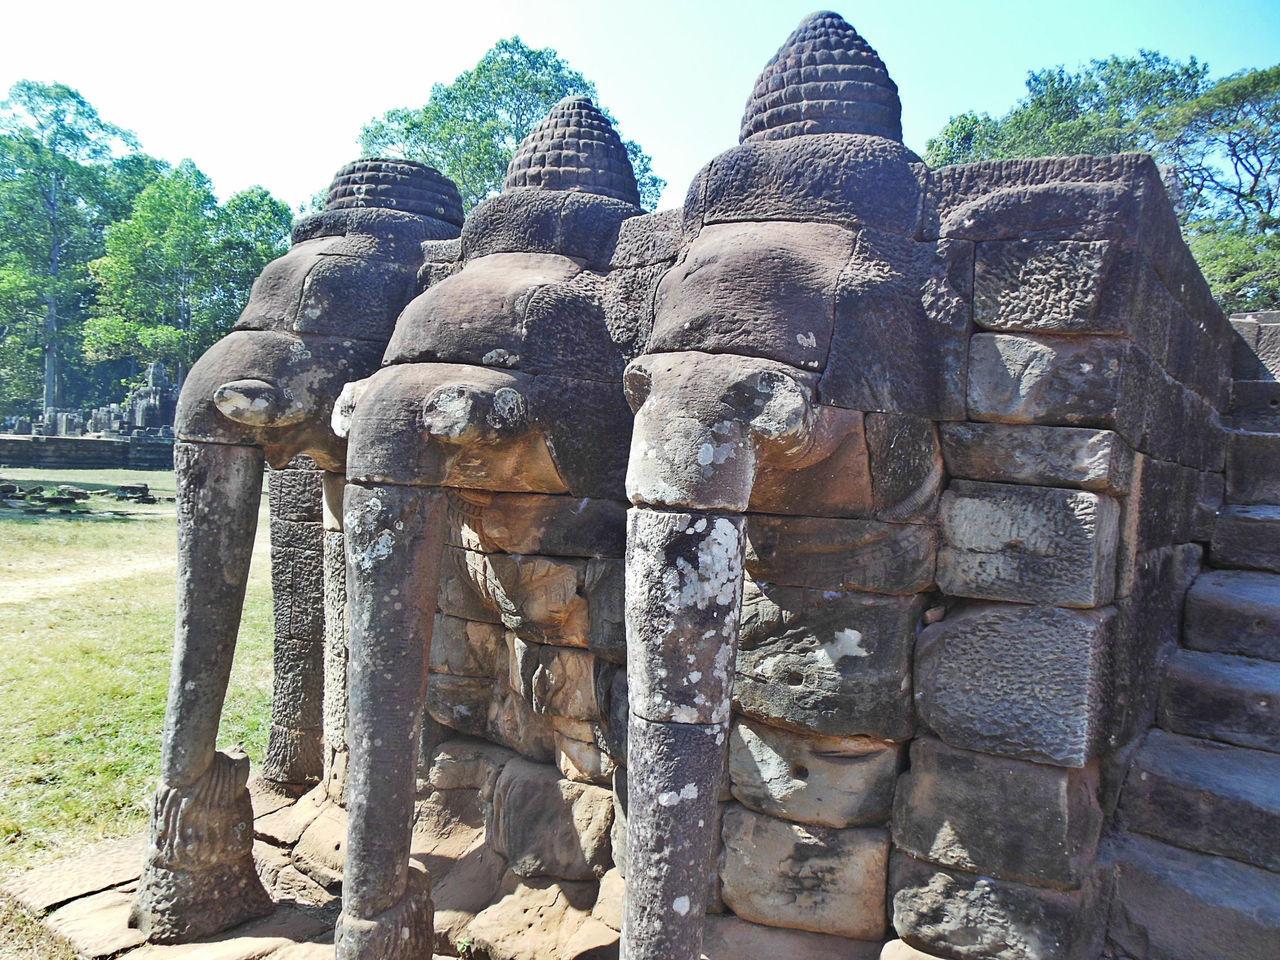 Ancient Architecture Ancient Civilization Angkor Elephant Terreace Angkor Thom Cambodia Elephant Terrace Eyeem Cambodia Eyeem History Khmer Empire No People Sculpture Travel Destinations